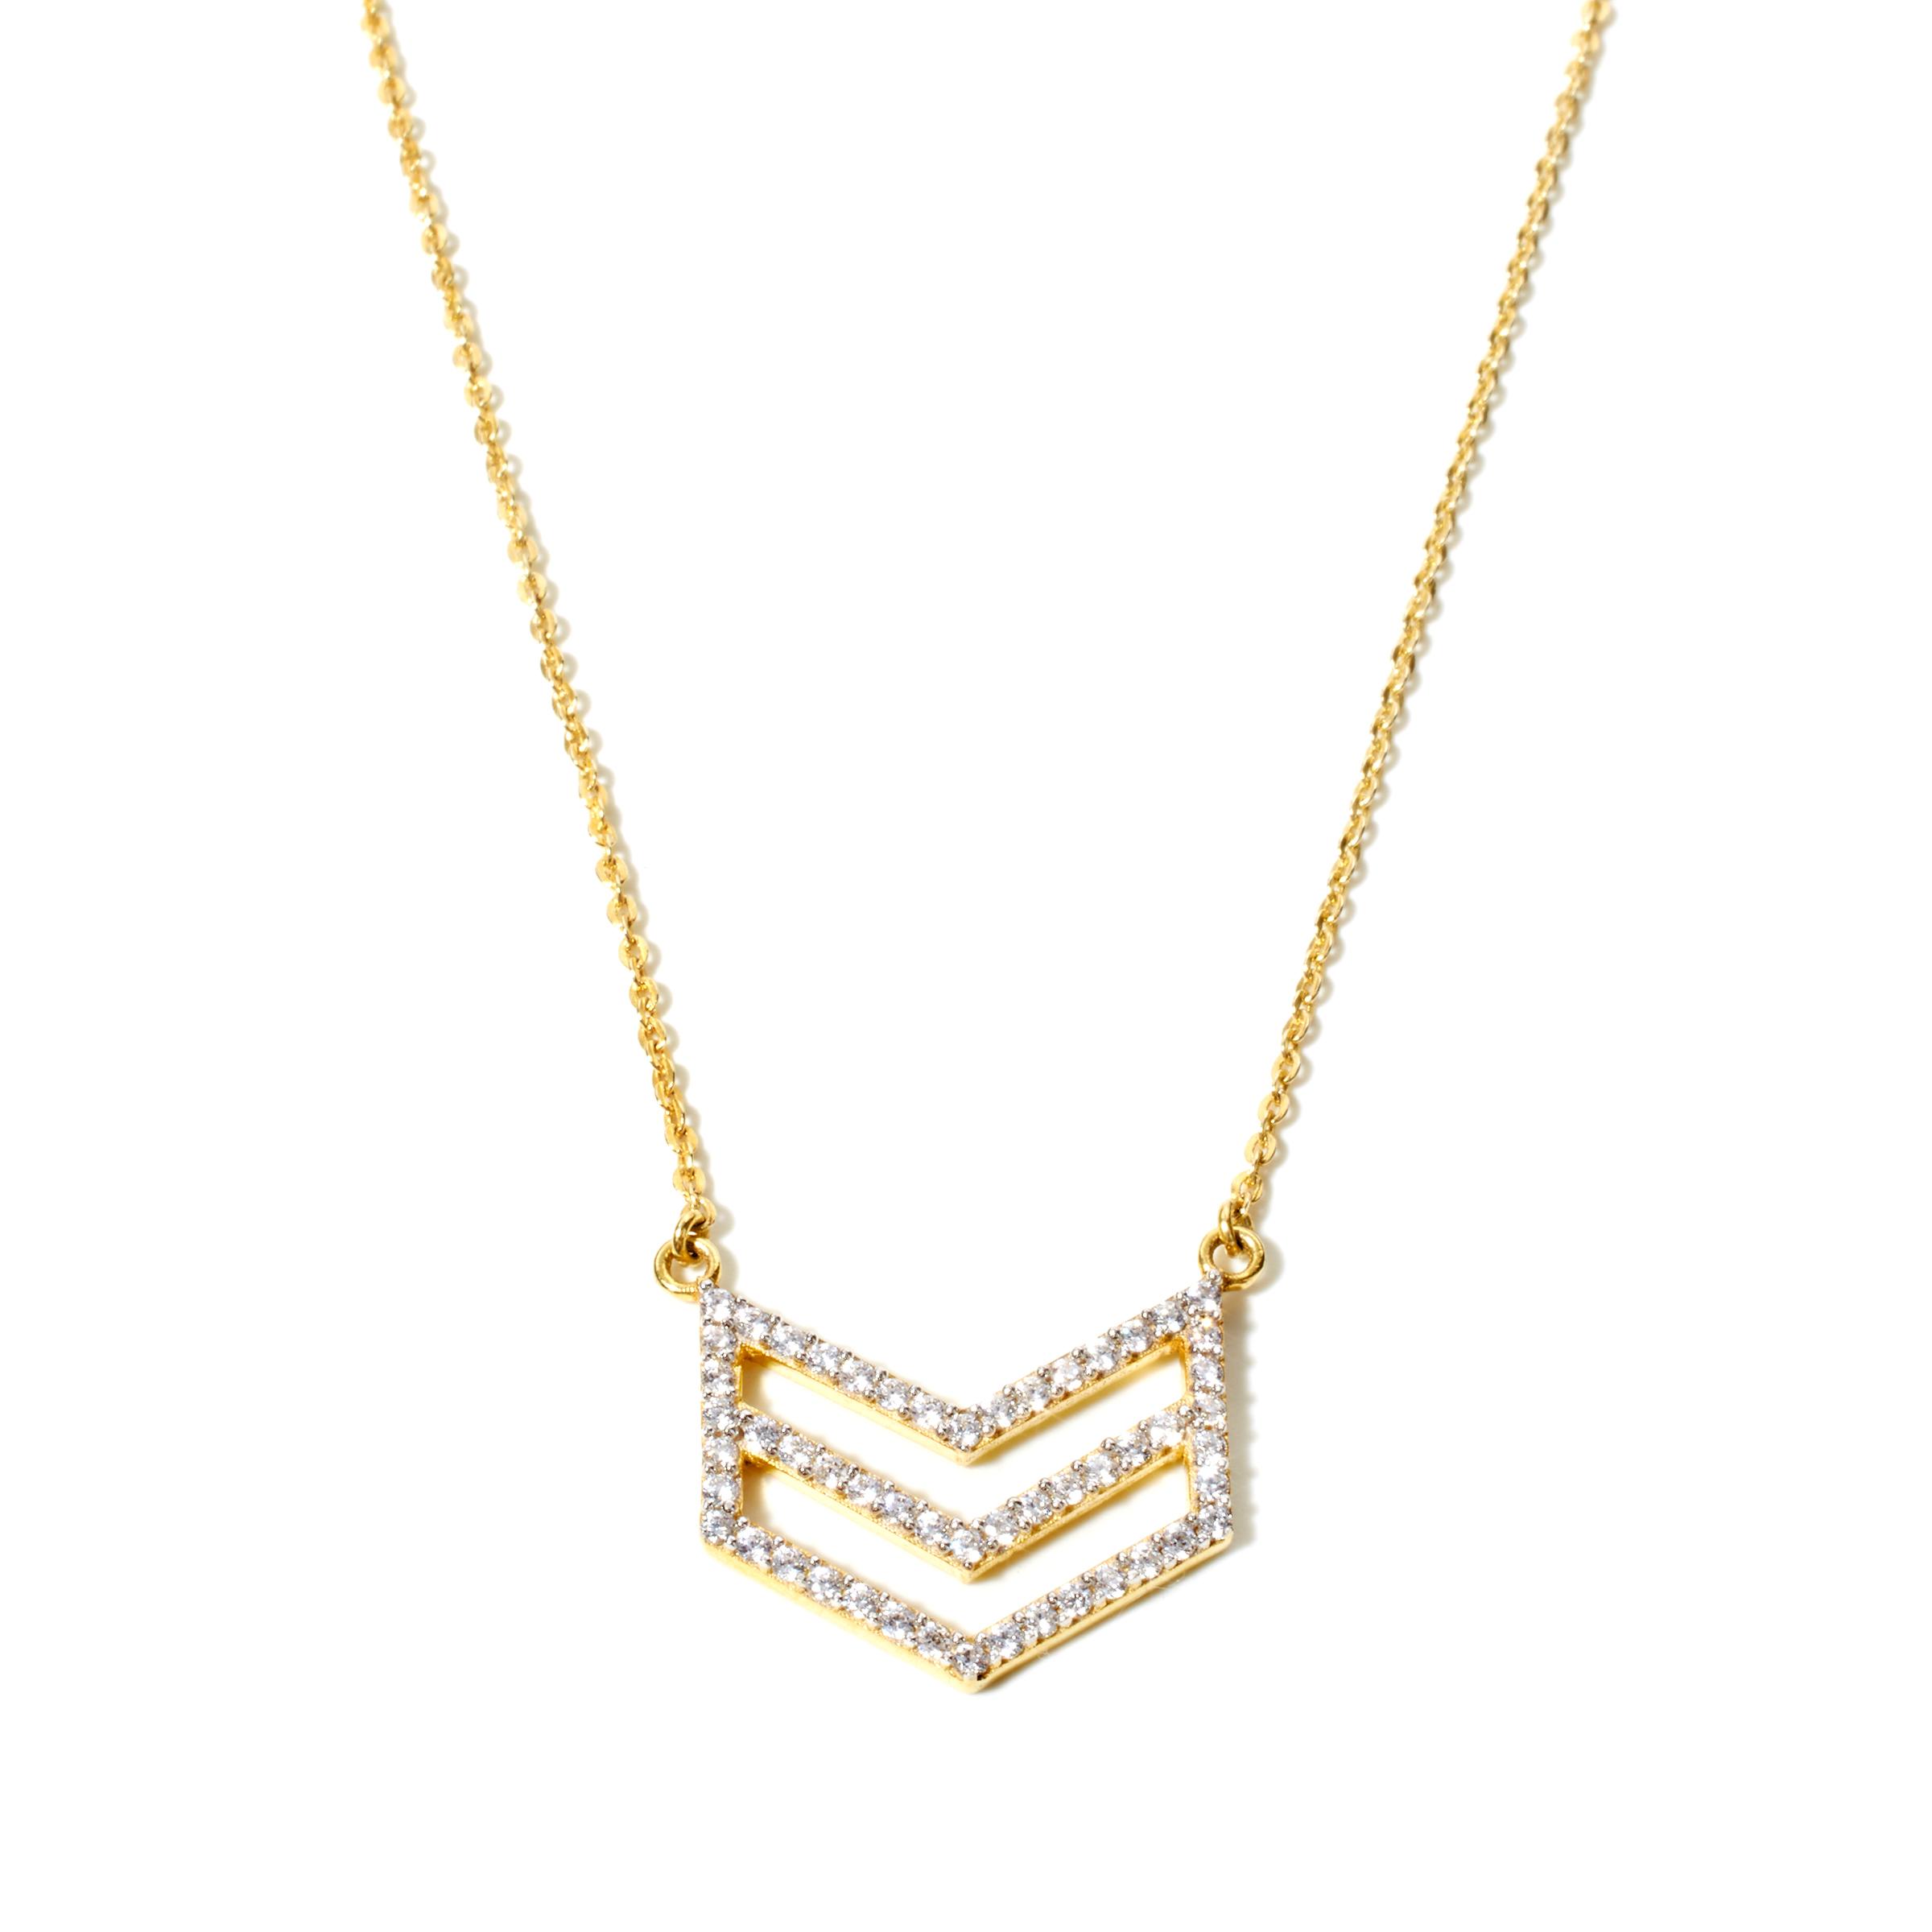 PR2973_0018_Jewelry_PR_Shots_455687